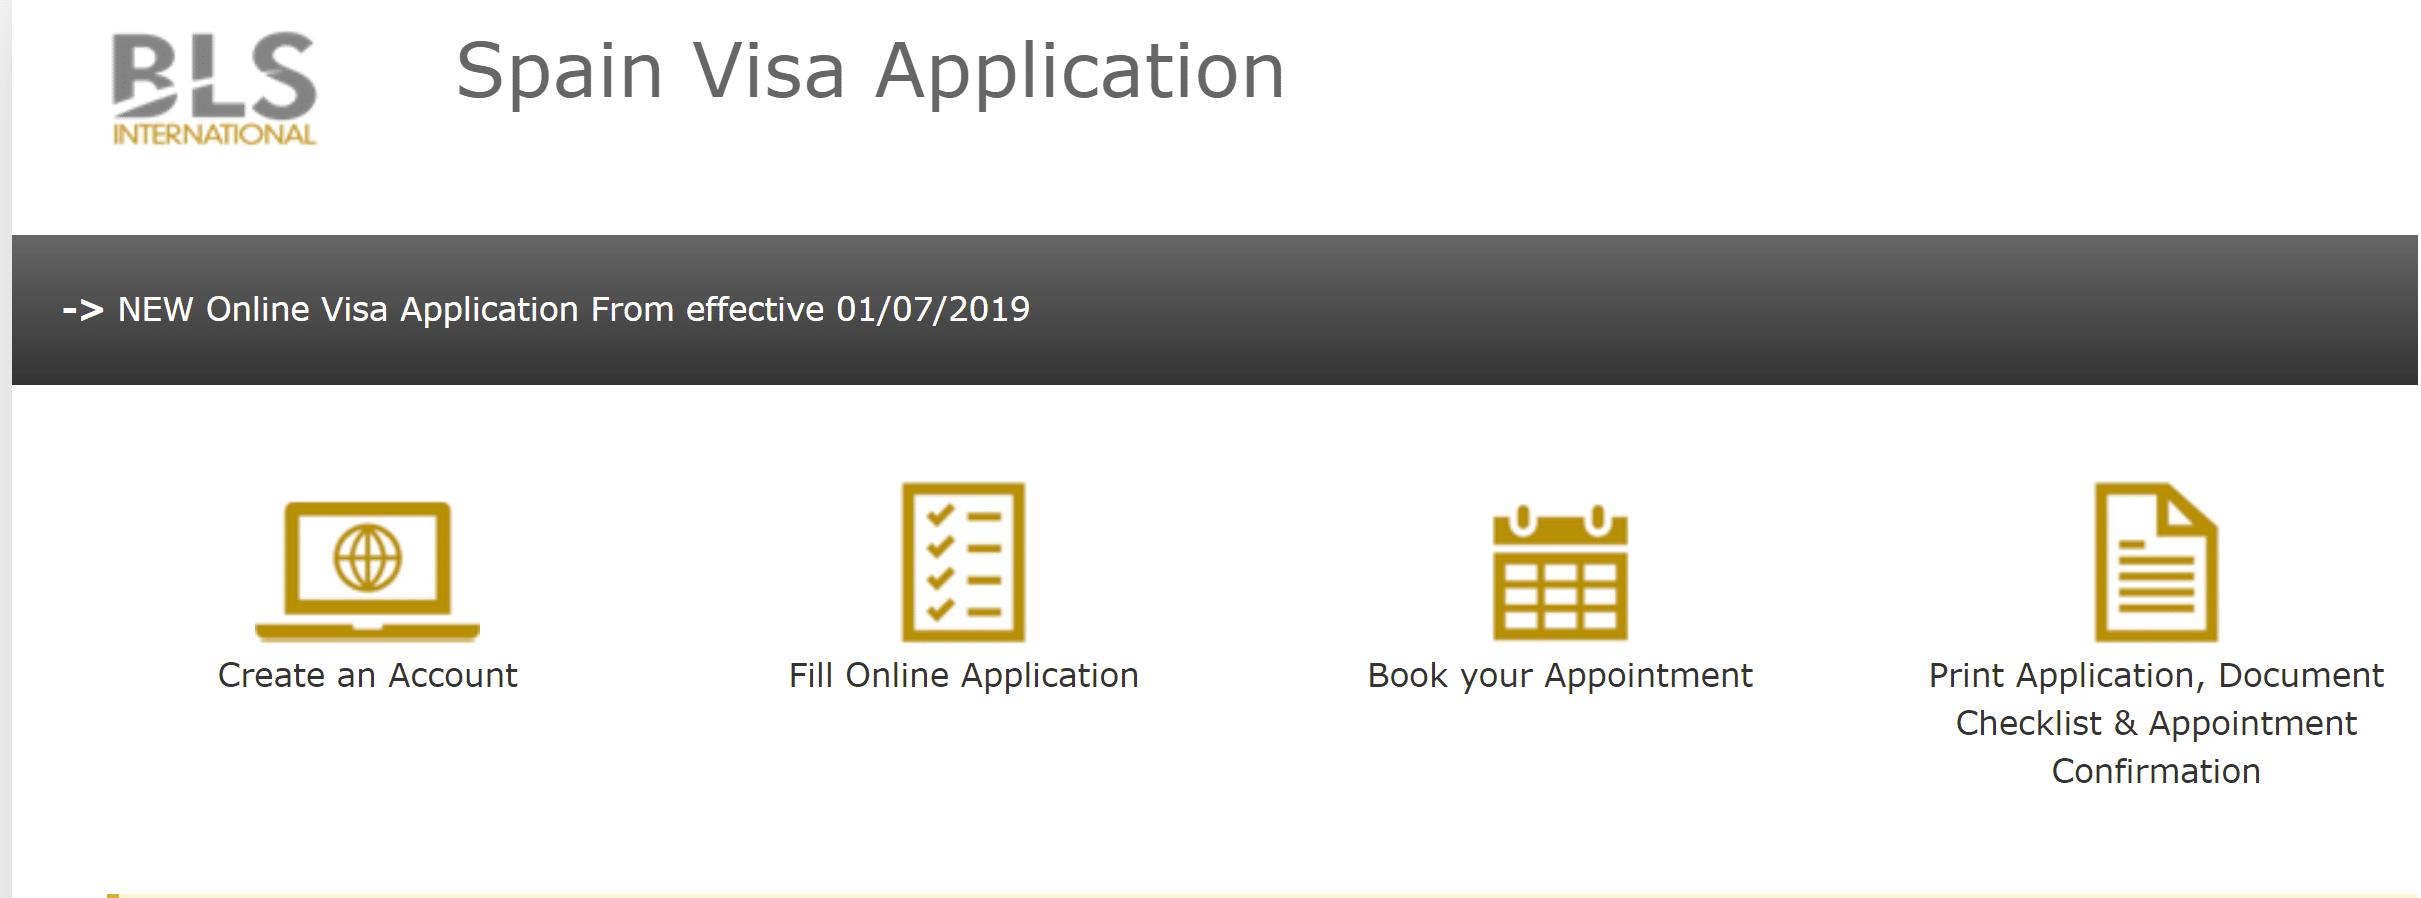 BLS-International-Kuwait-Schengen-Visa-Process